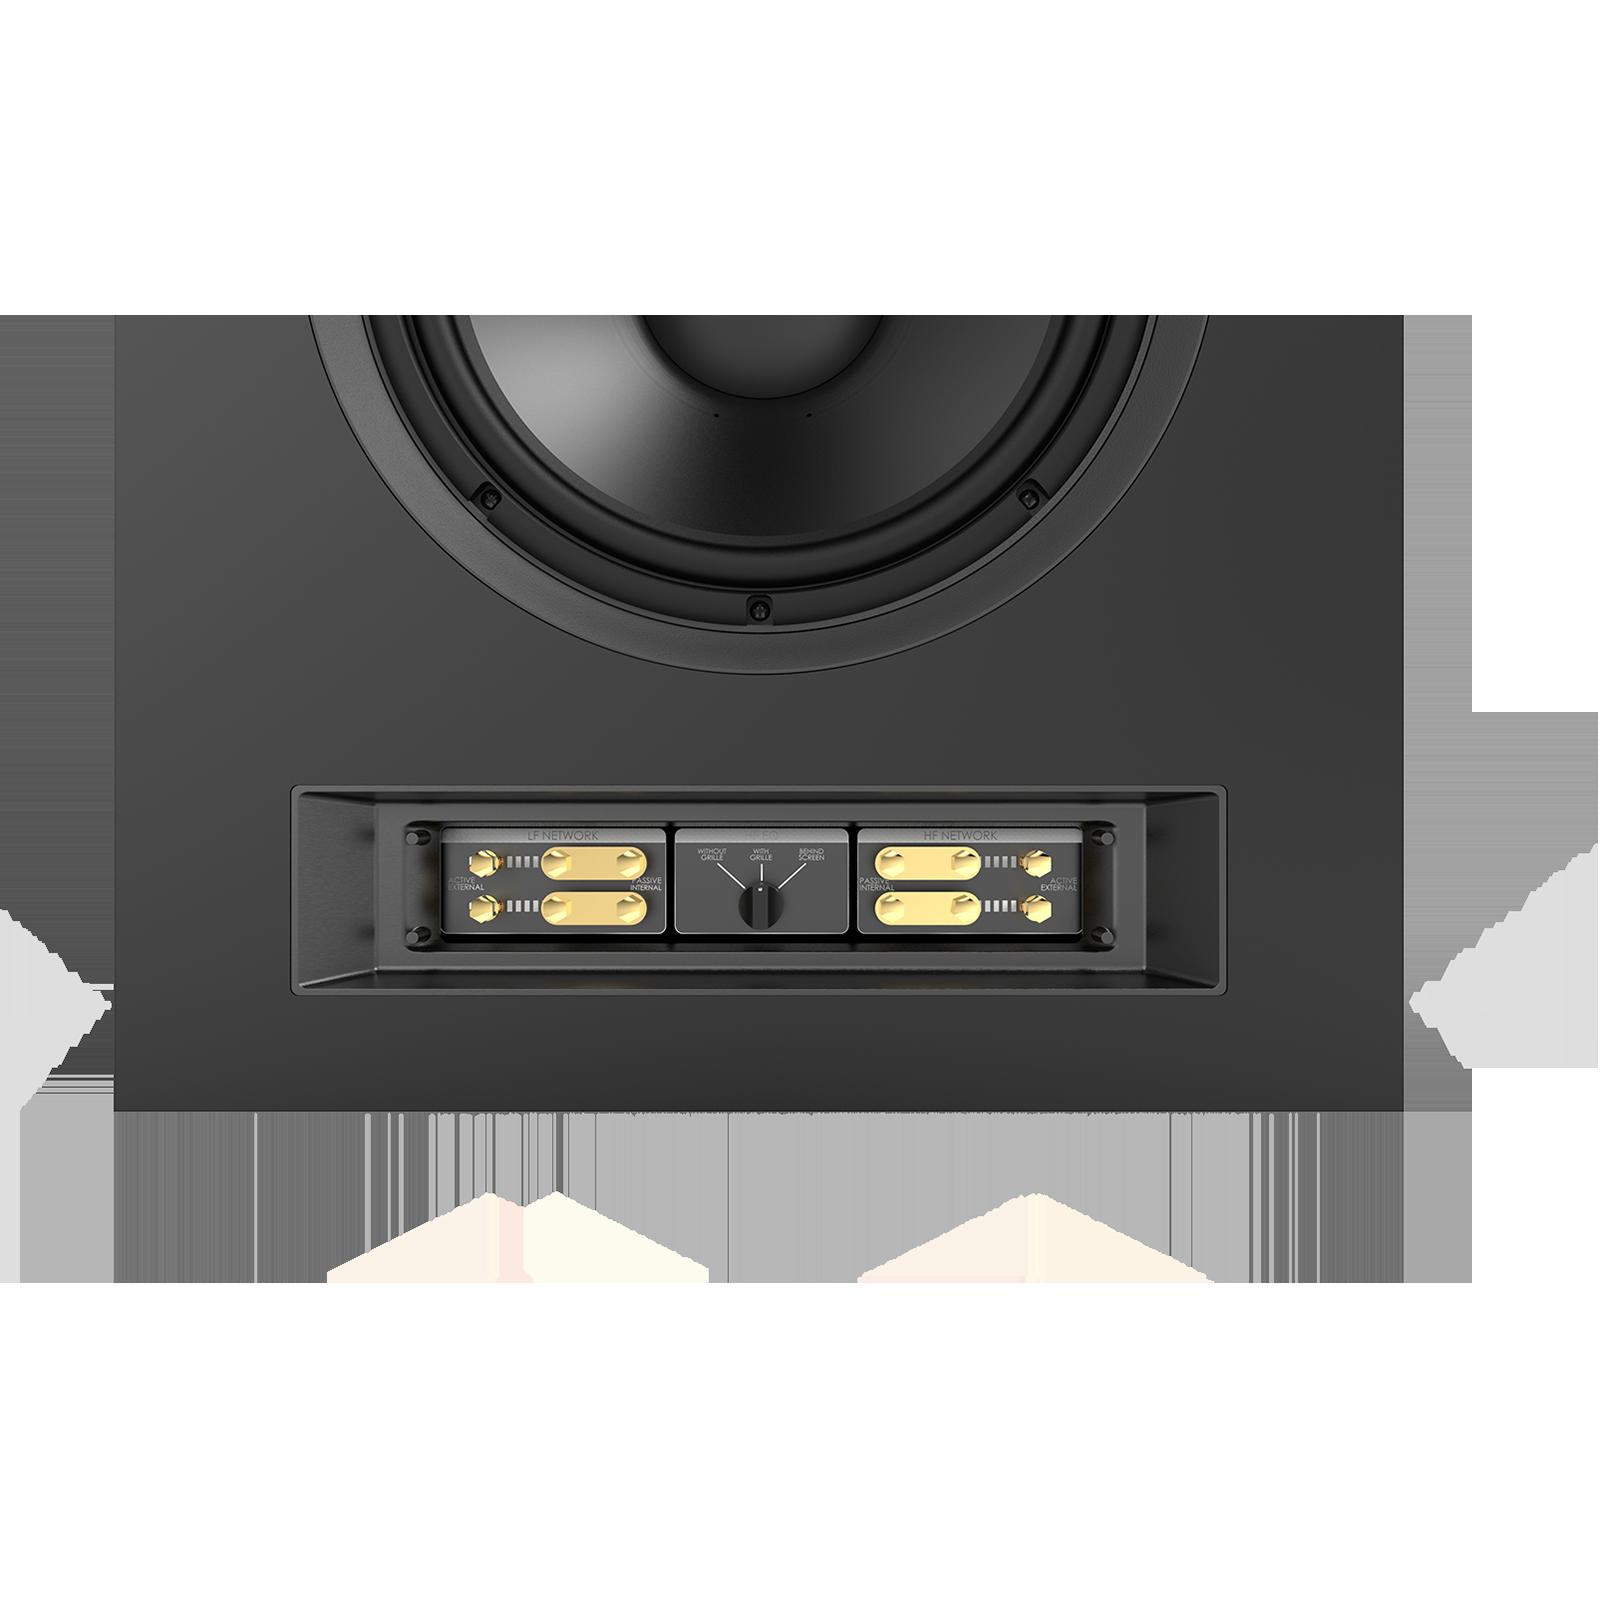 SCL-1 - Black - 2-Way Dual 12-inch (300mm) Custom LCR Loudspeaker - Detailshot 4